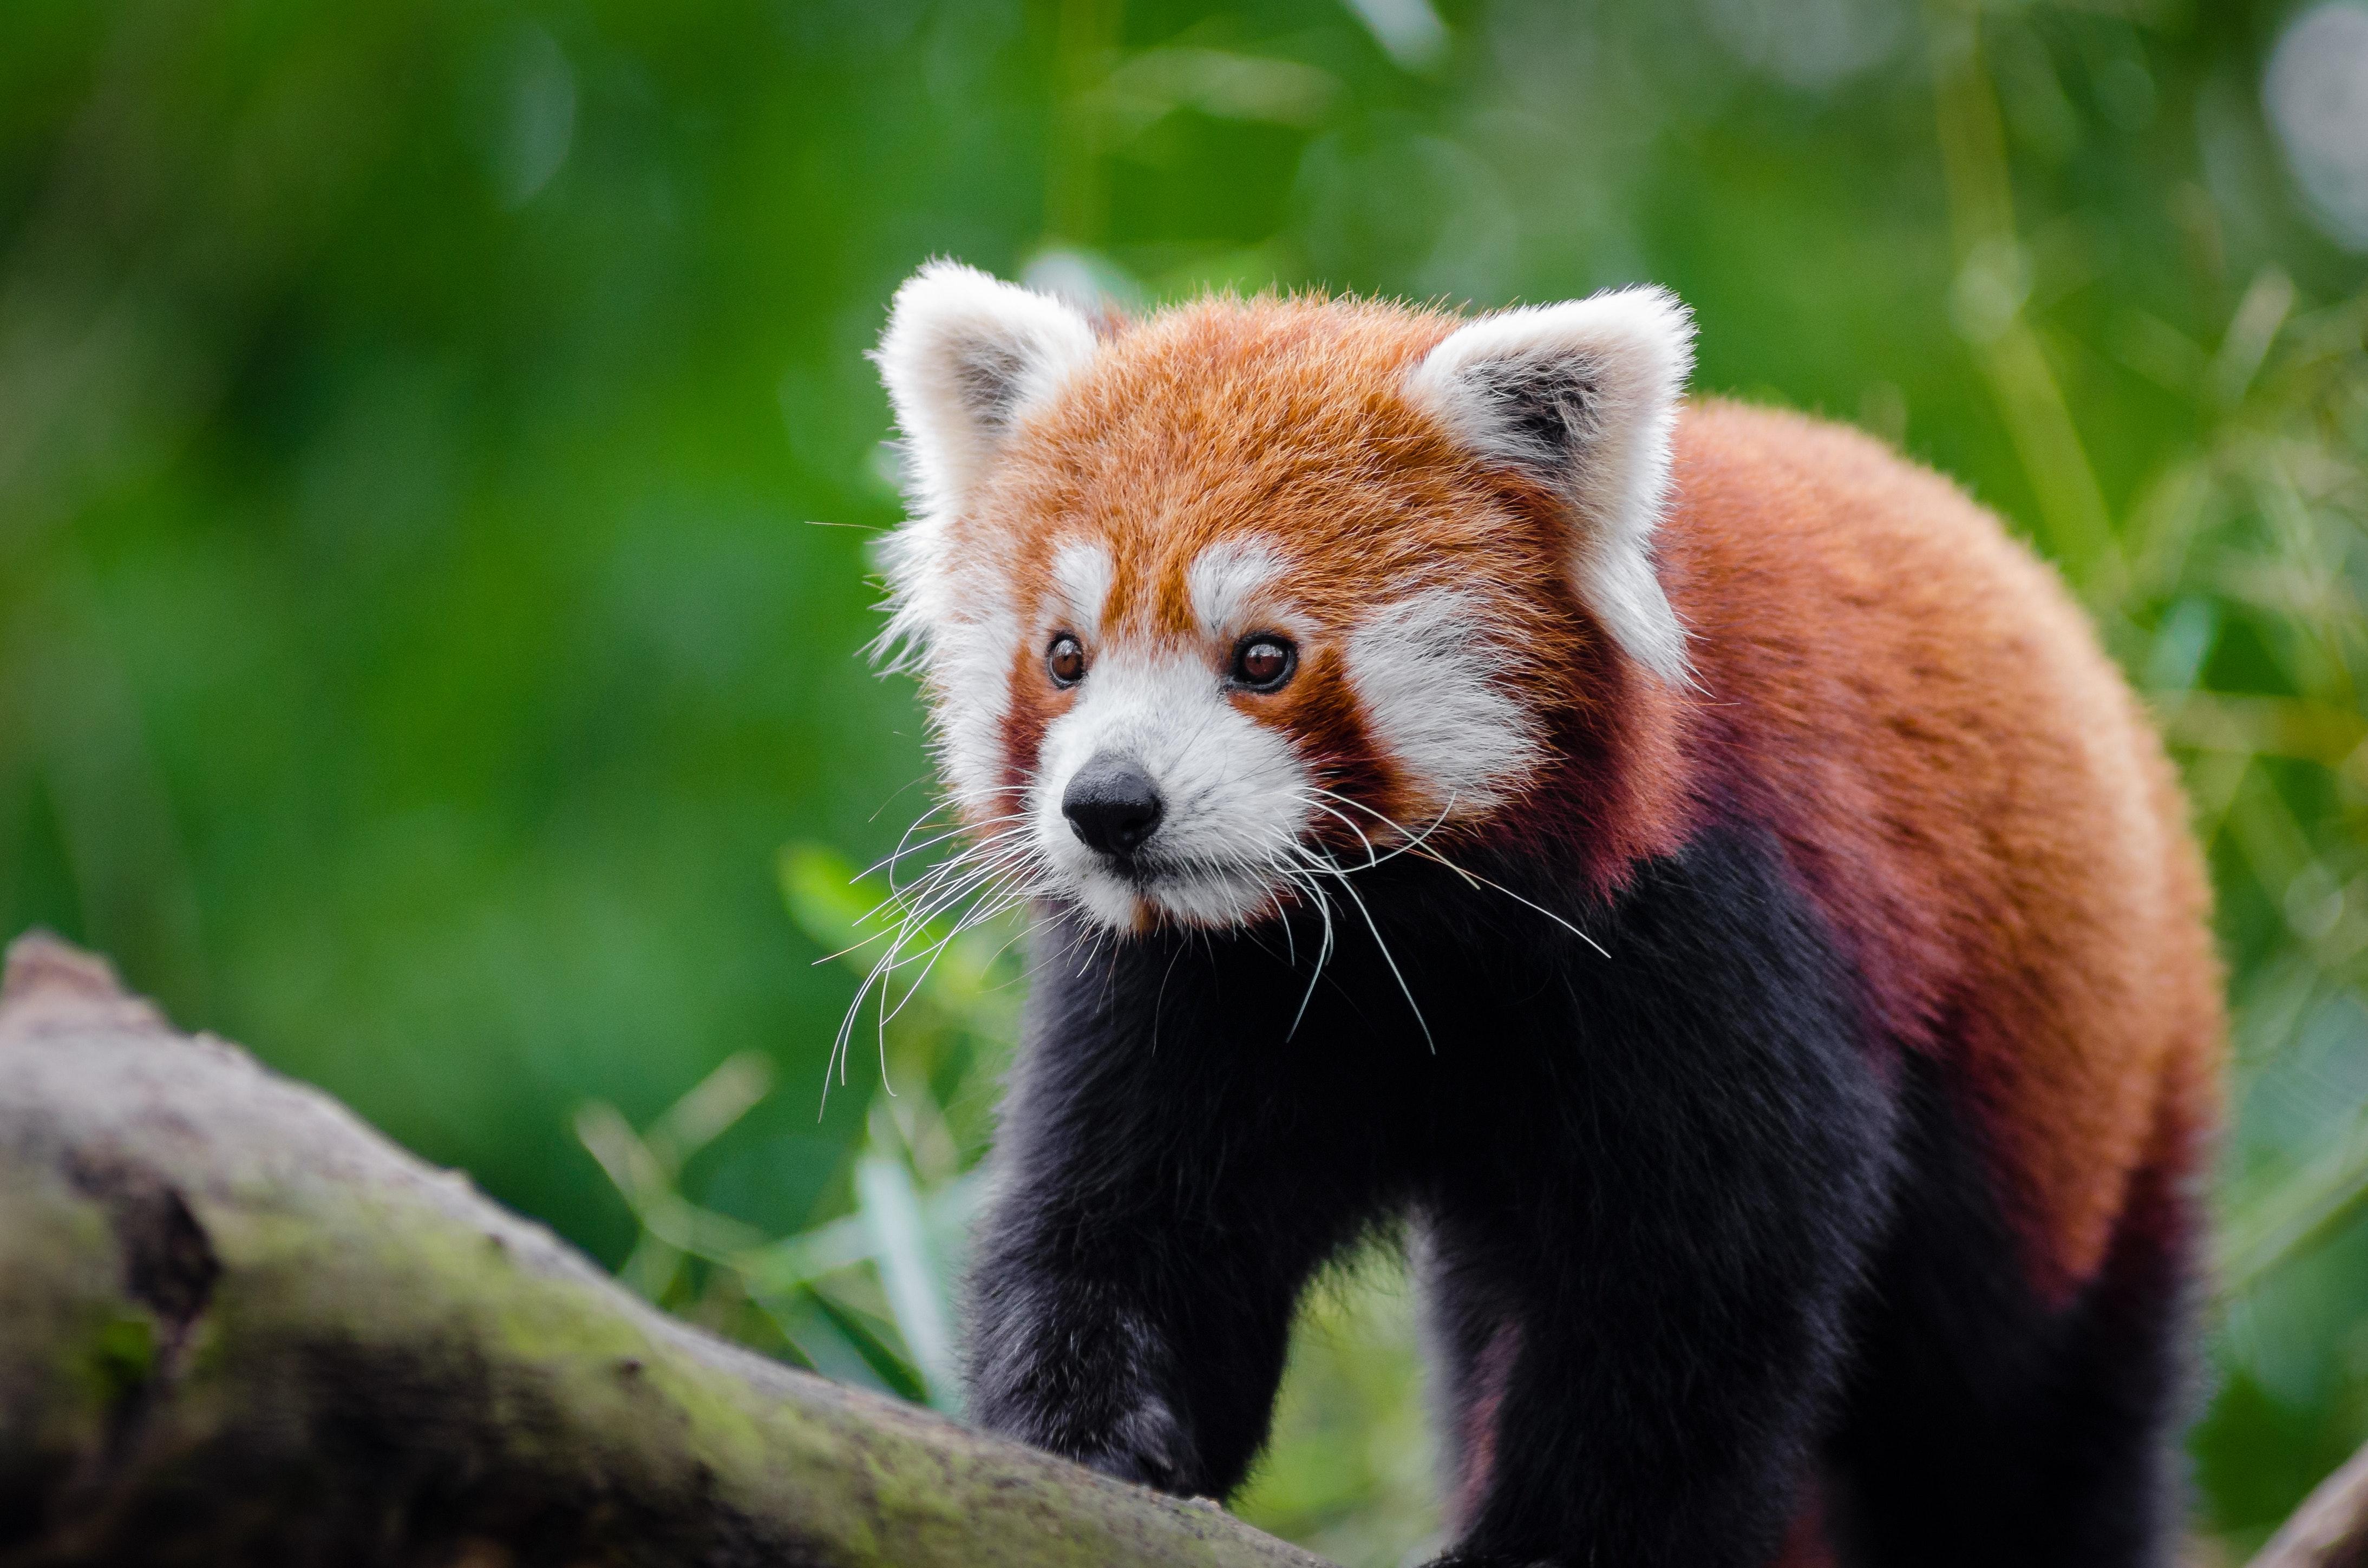 Red panda on brown wood photo